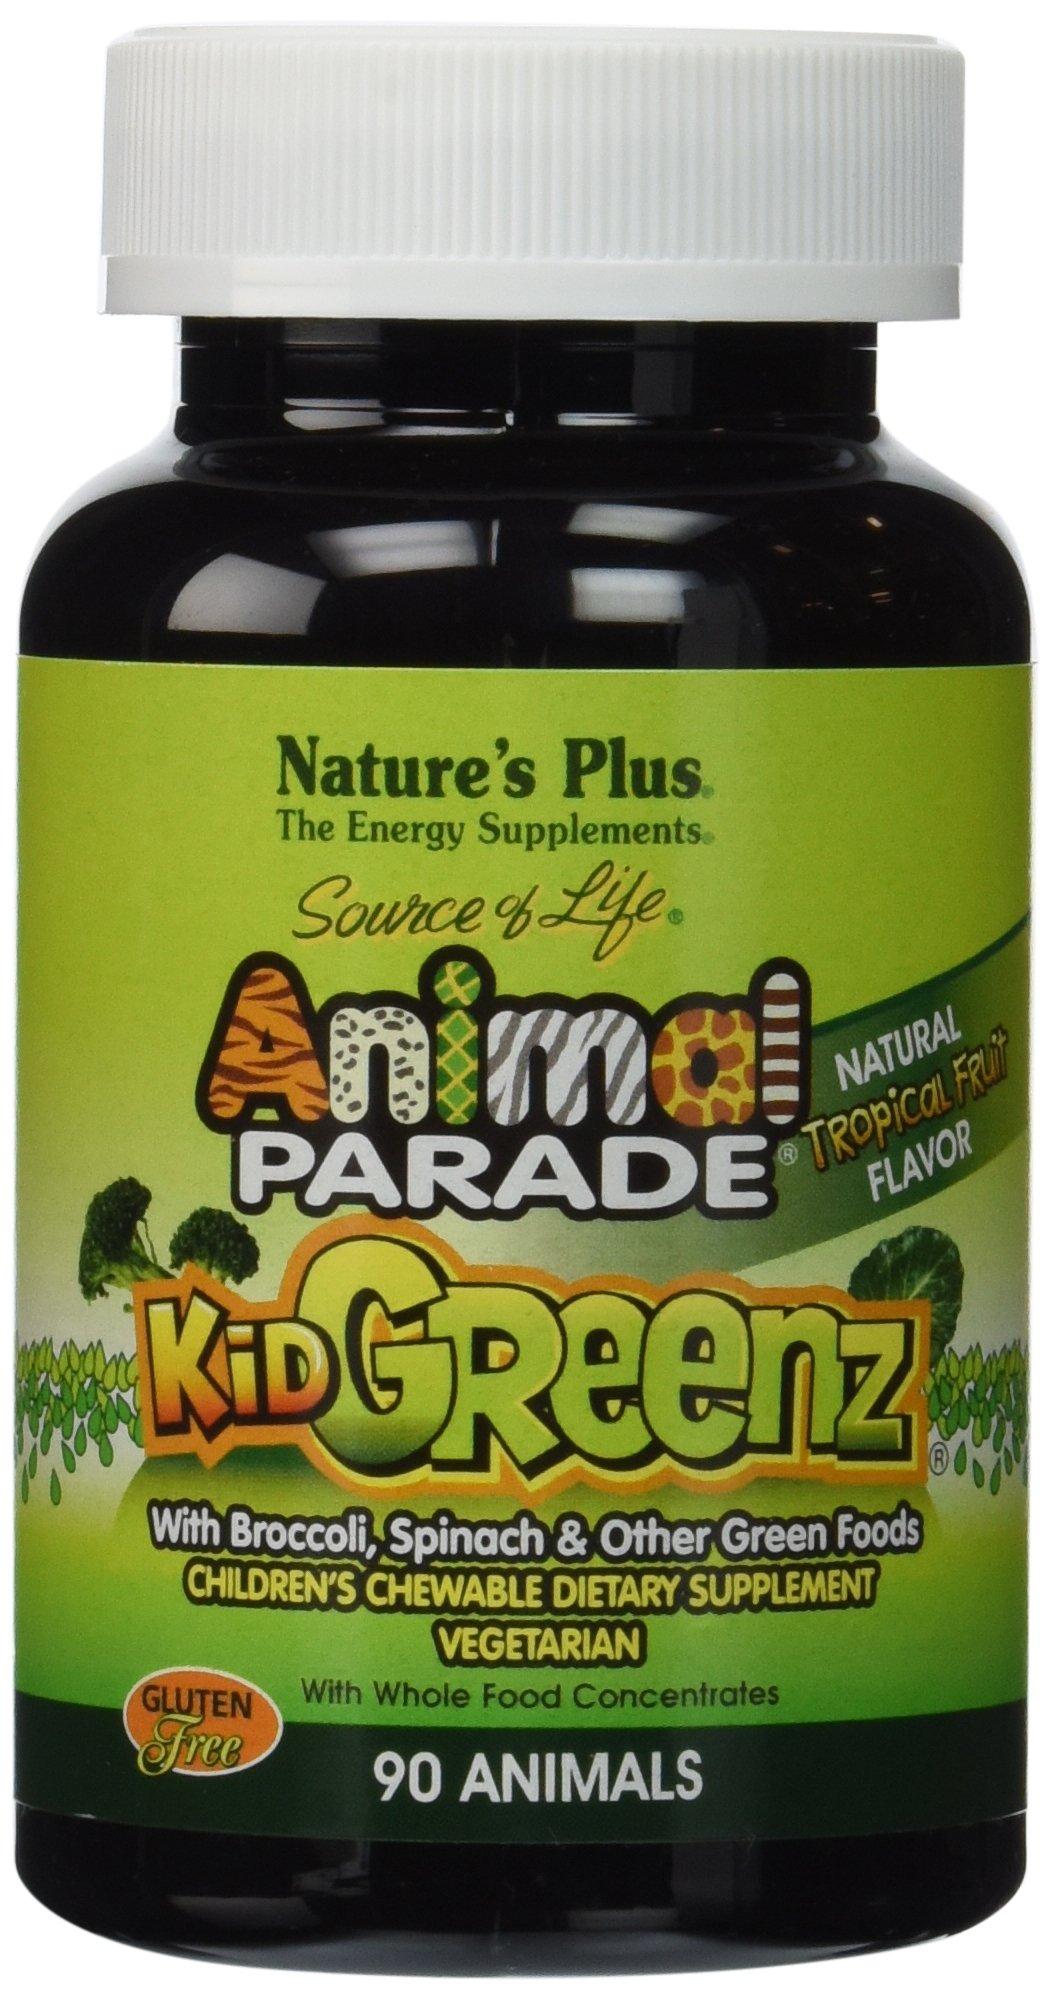 Nature's Plus - Animal Parade KidGreenz Children's Chewable - Tropical Fruit Flavor, 90 count